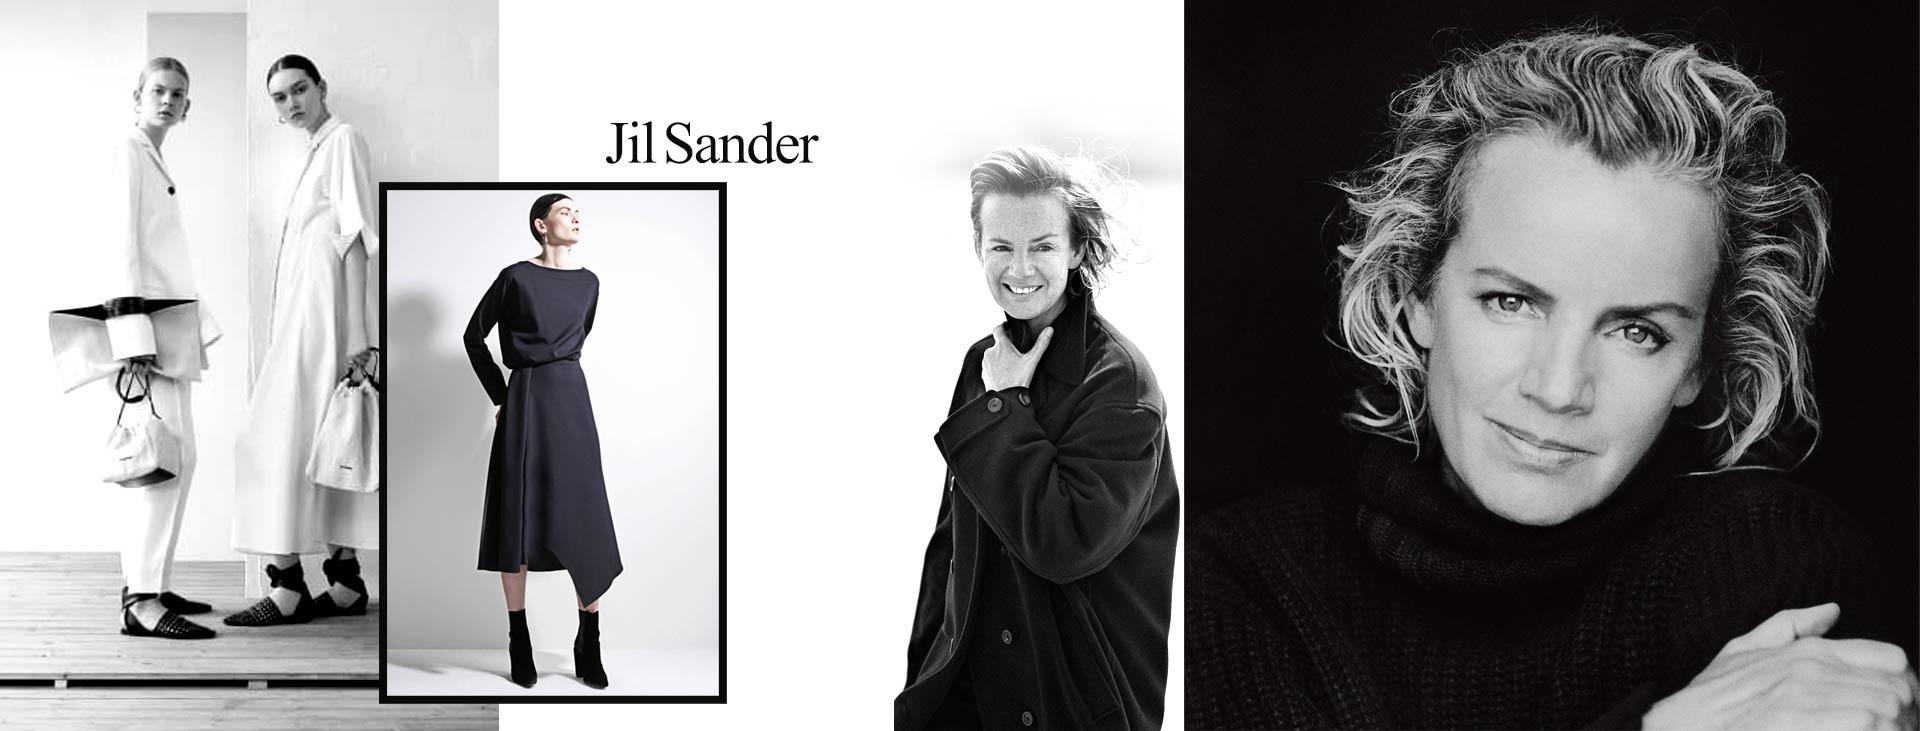 Jil Sander - زنان پیشگام در صنعت مد